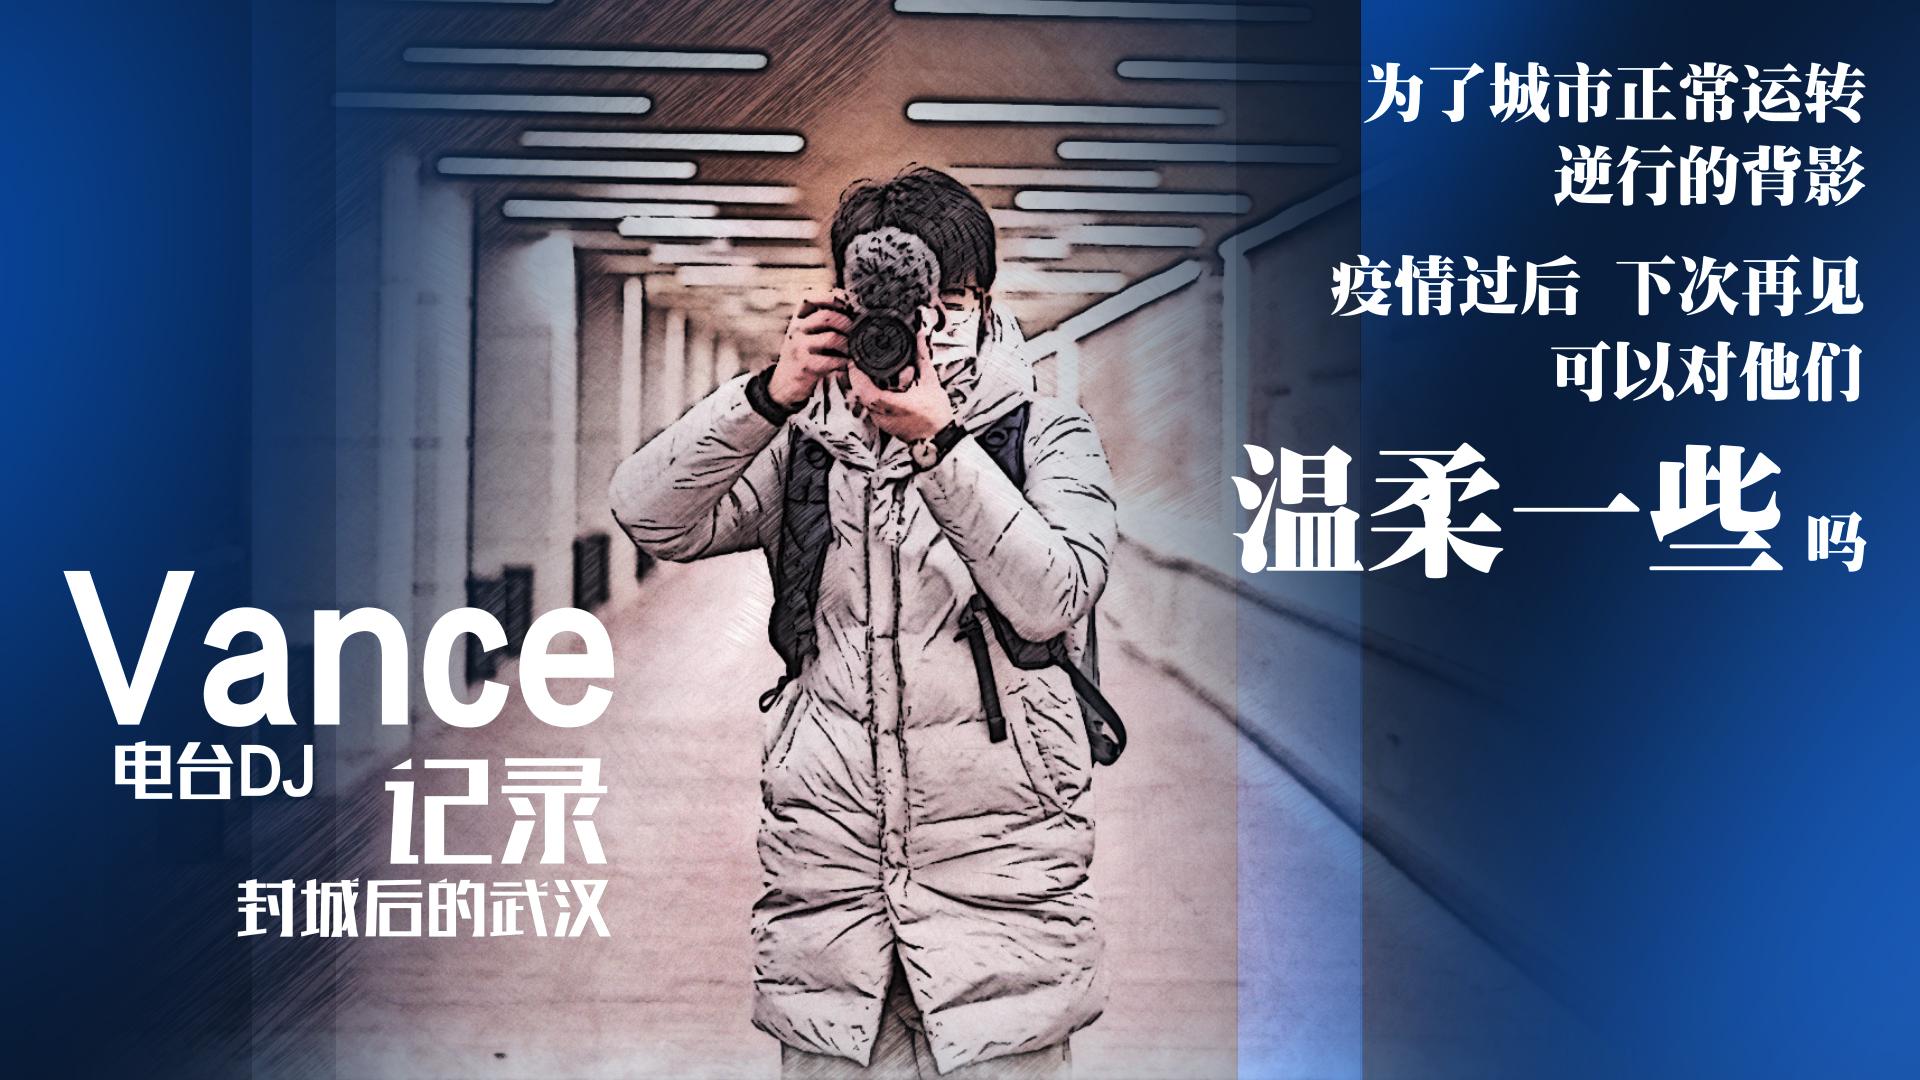 7Vance.jpg